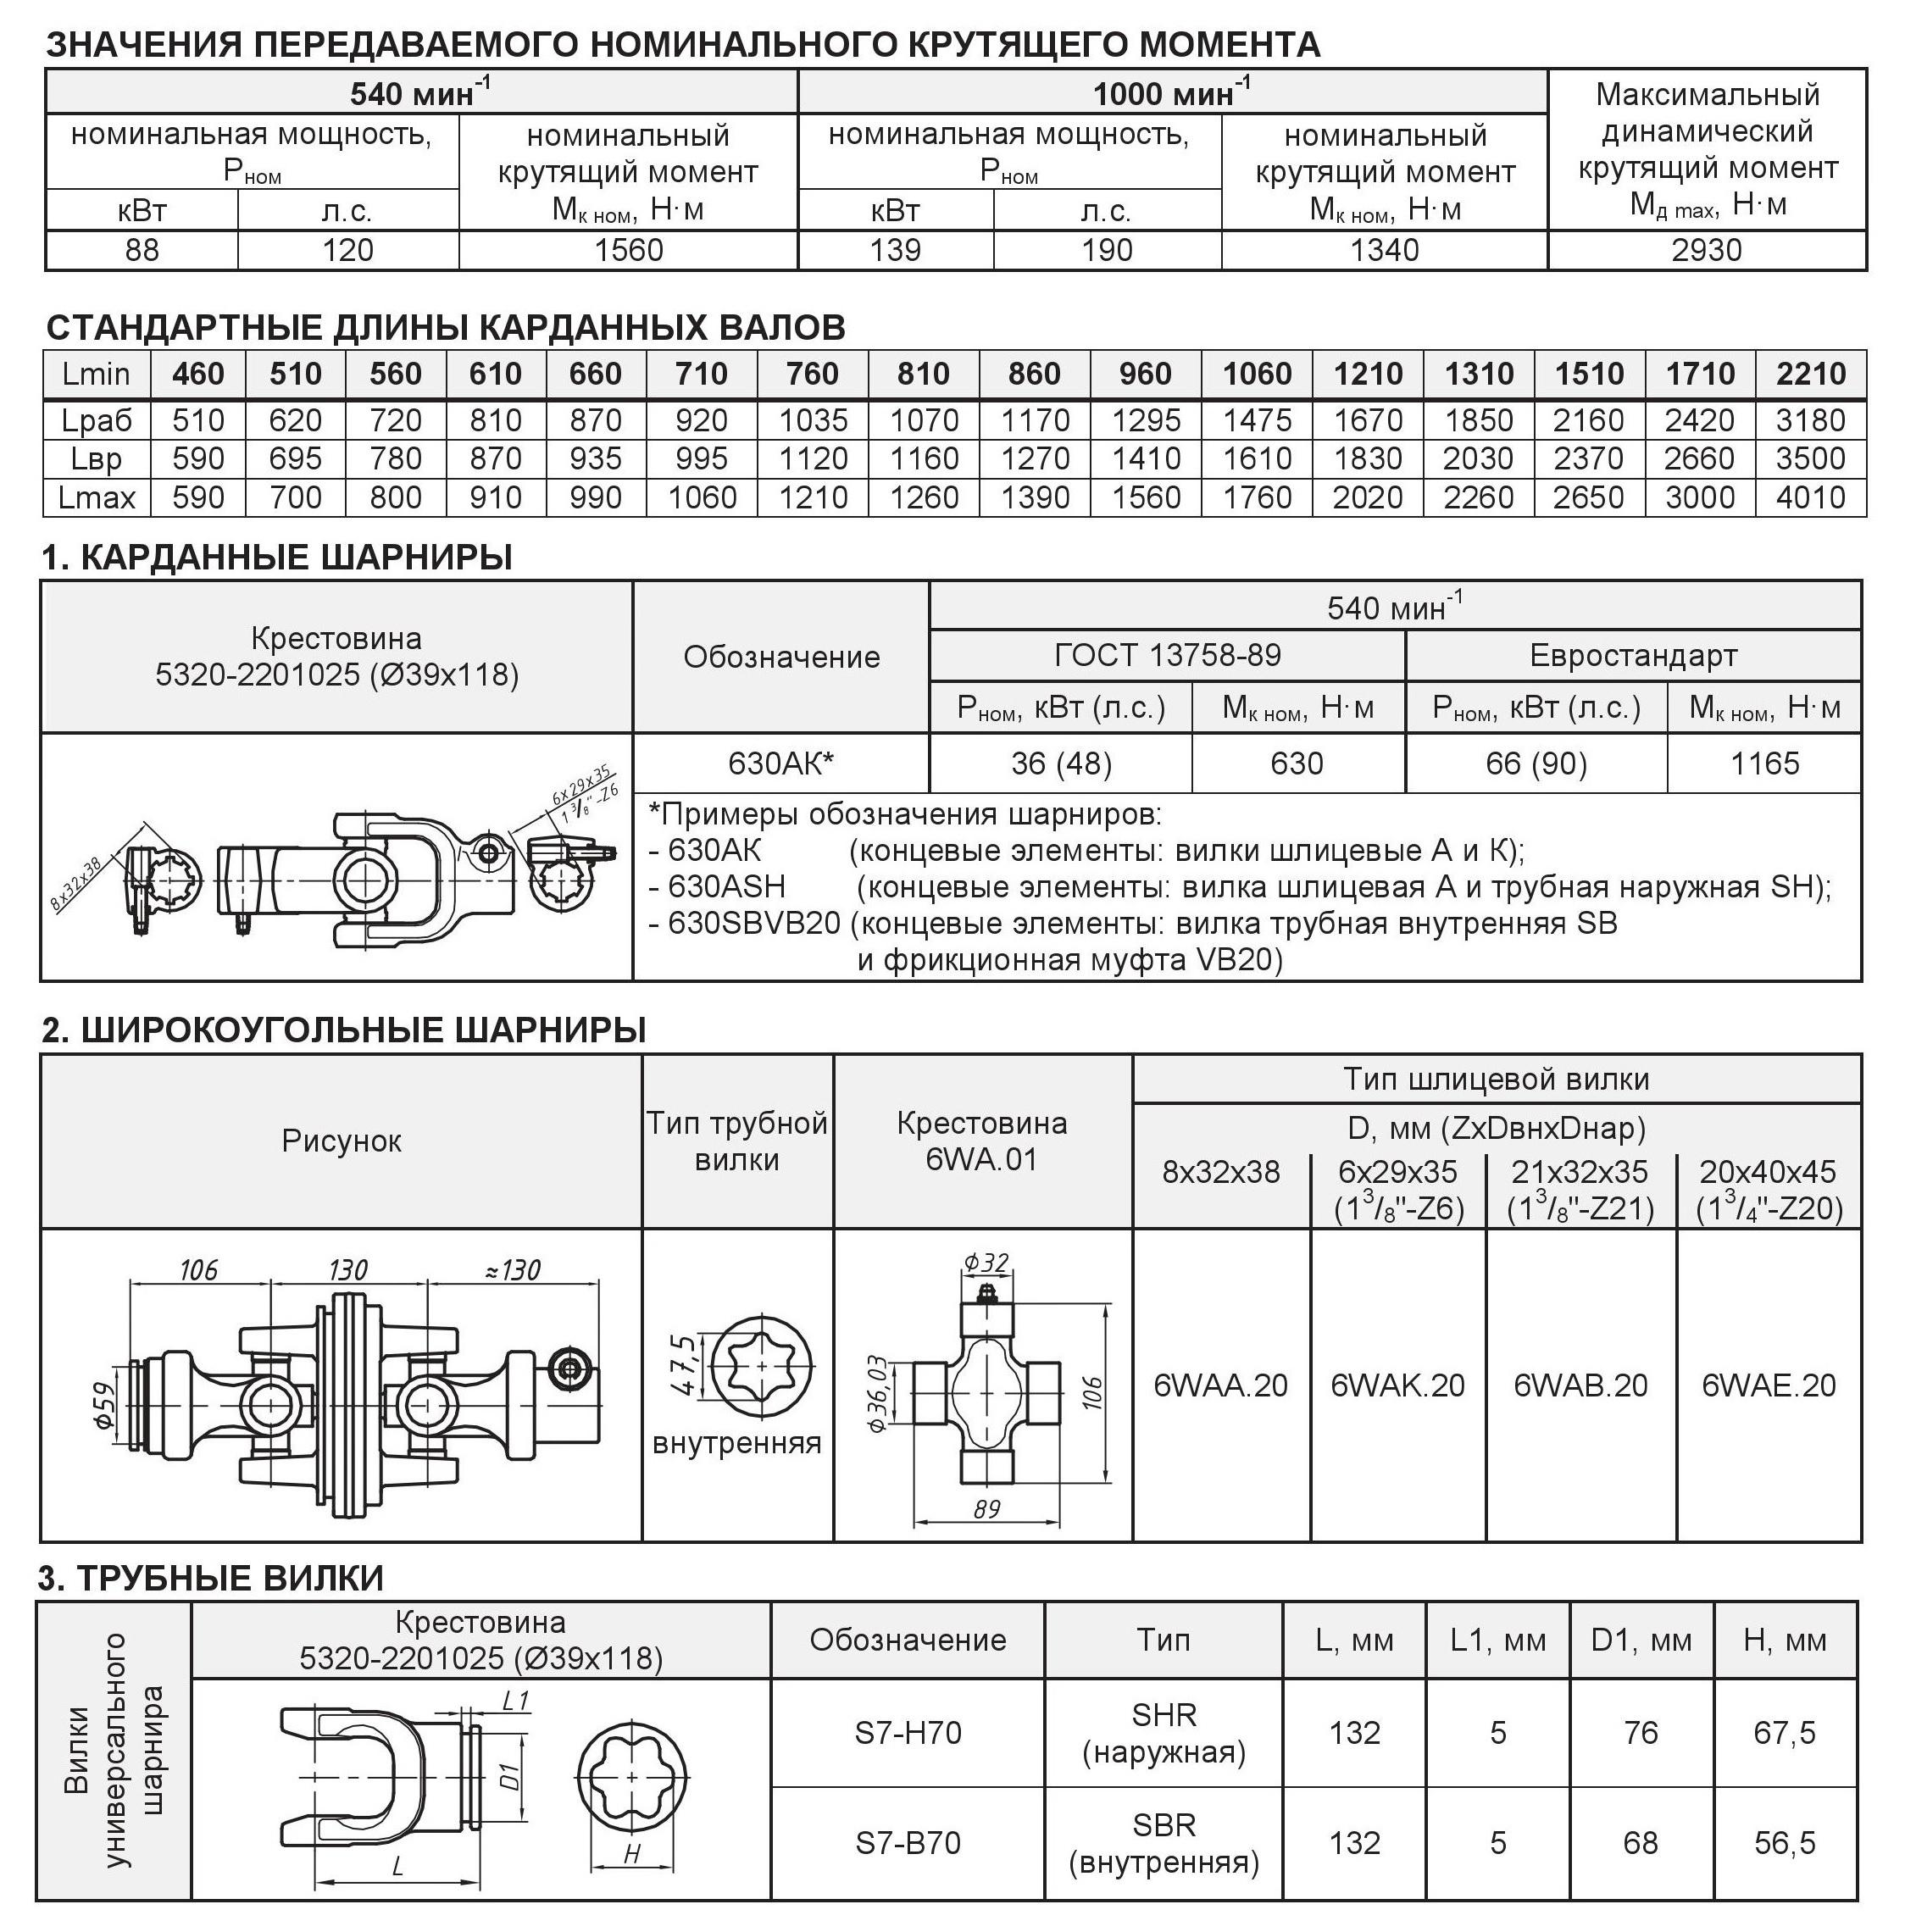 Элементы карданных валов типа S7